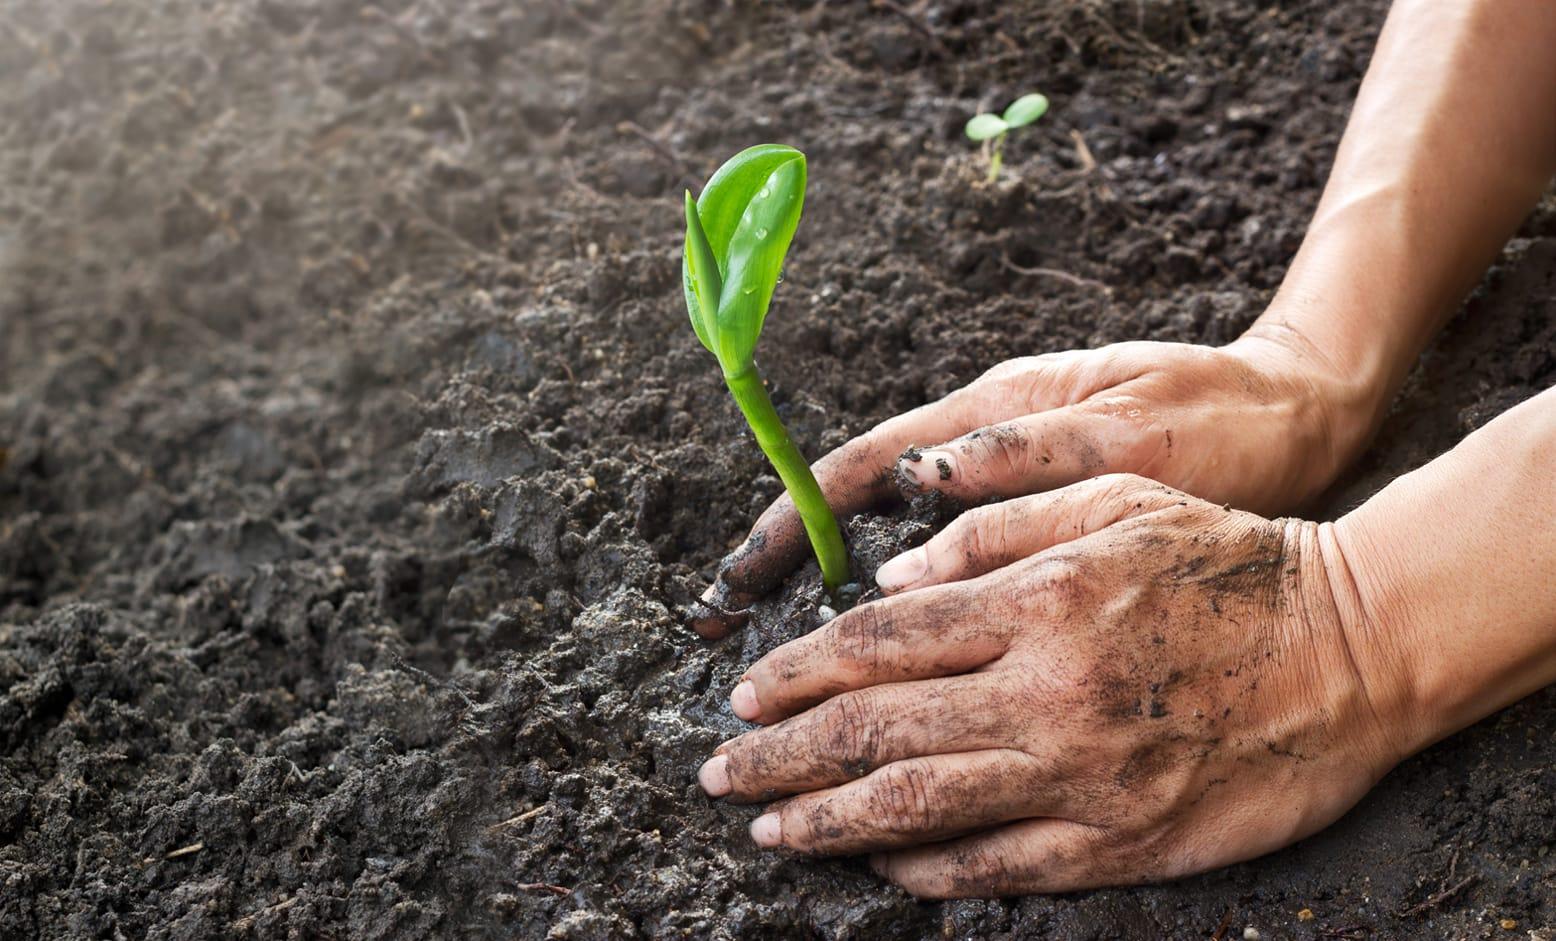 Gardening Man Planting By Hand